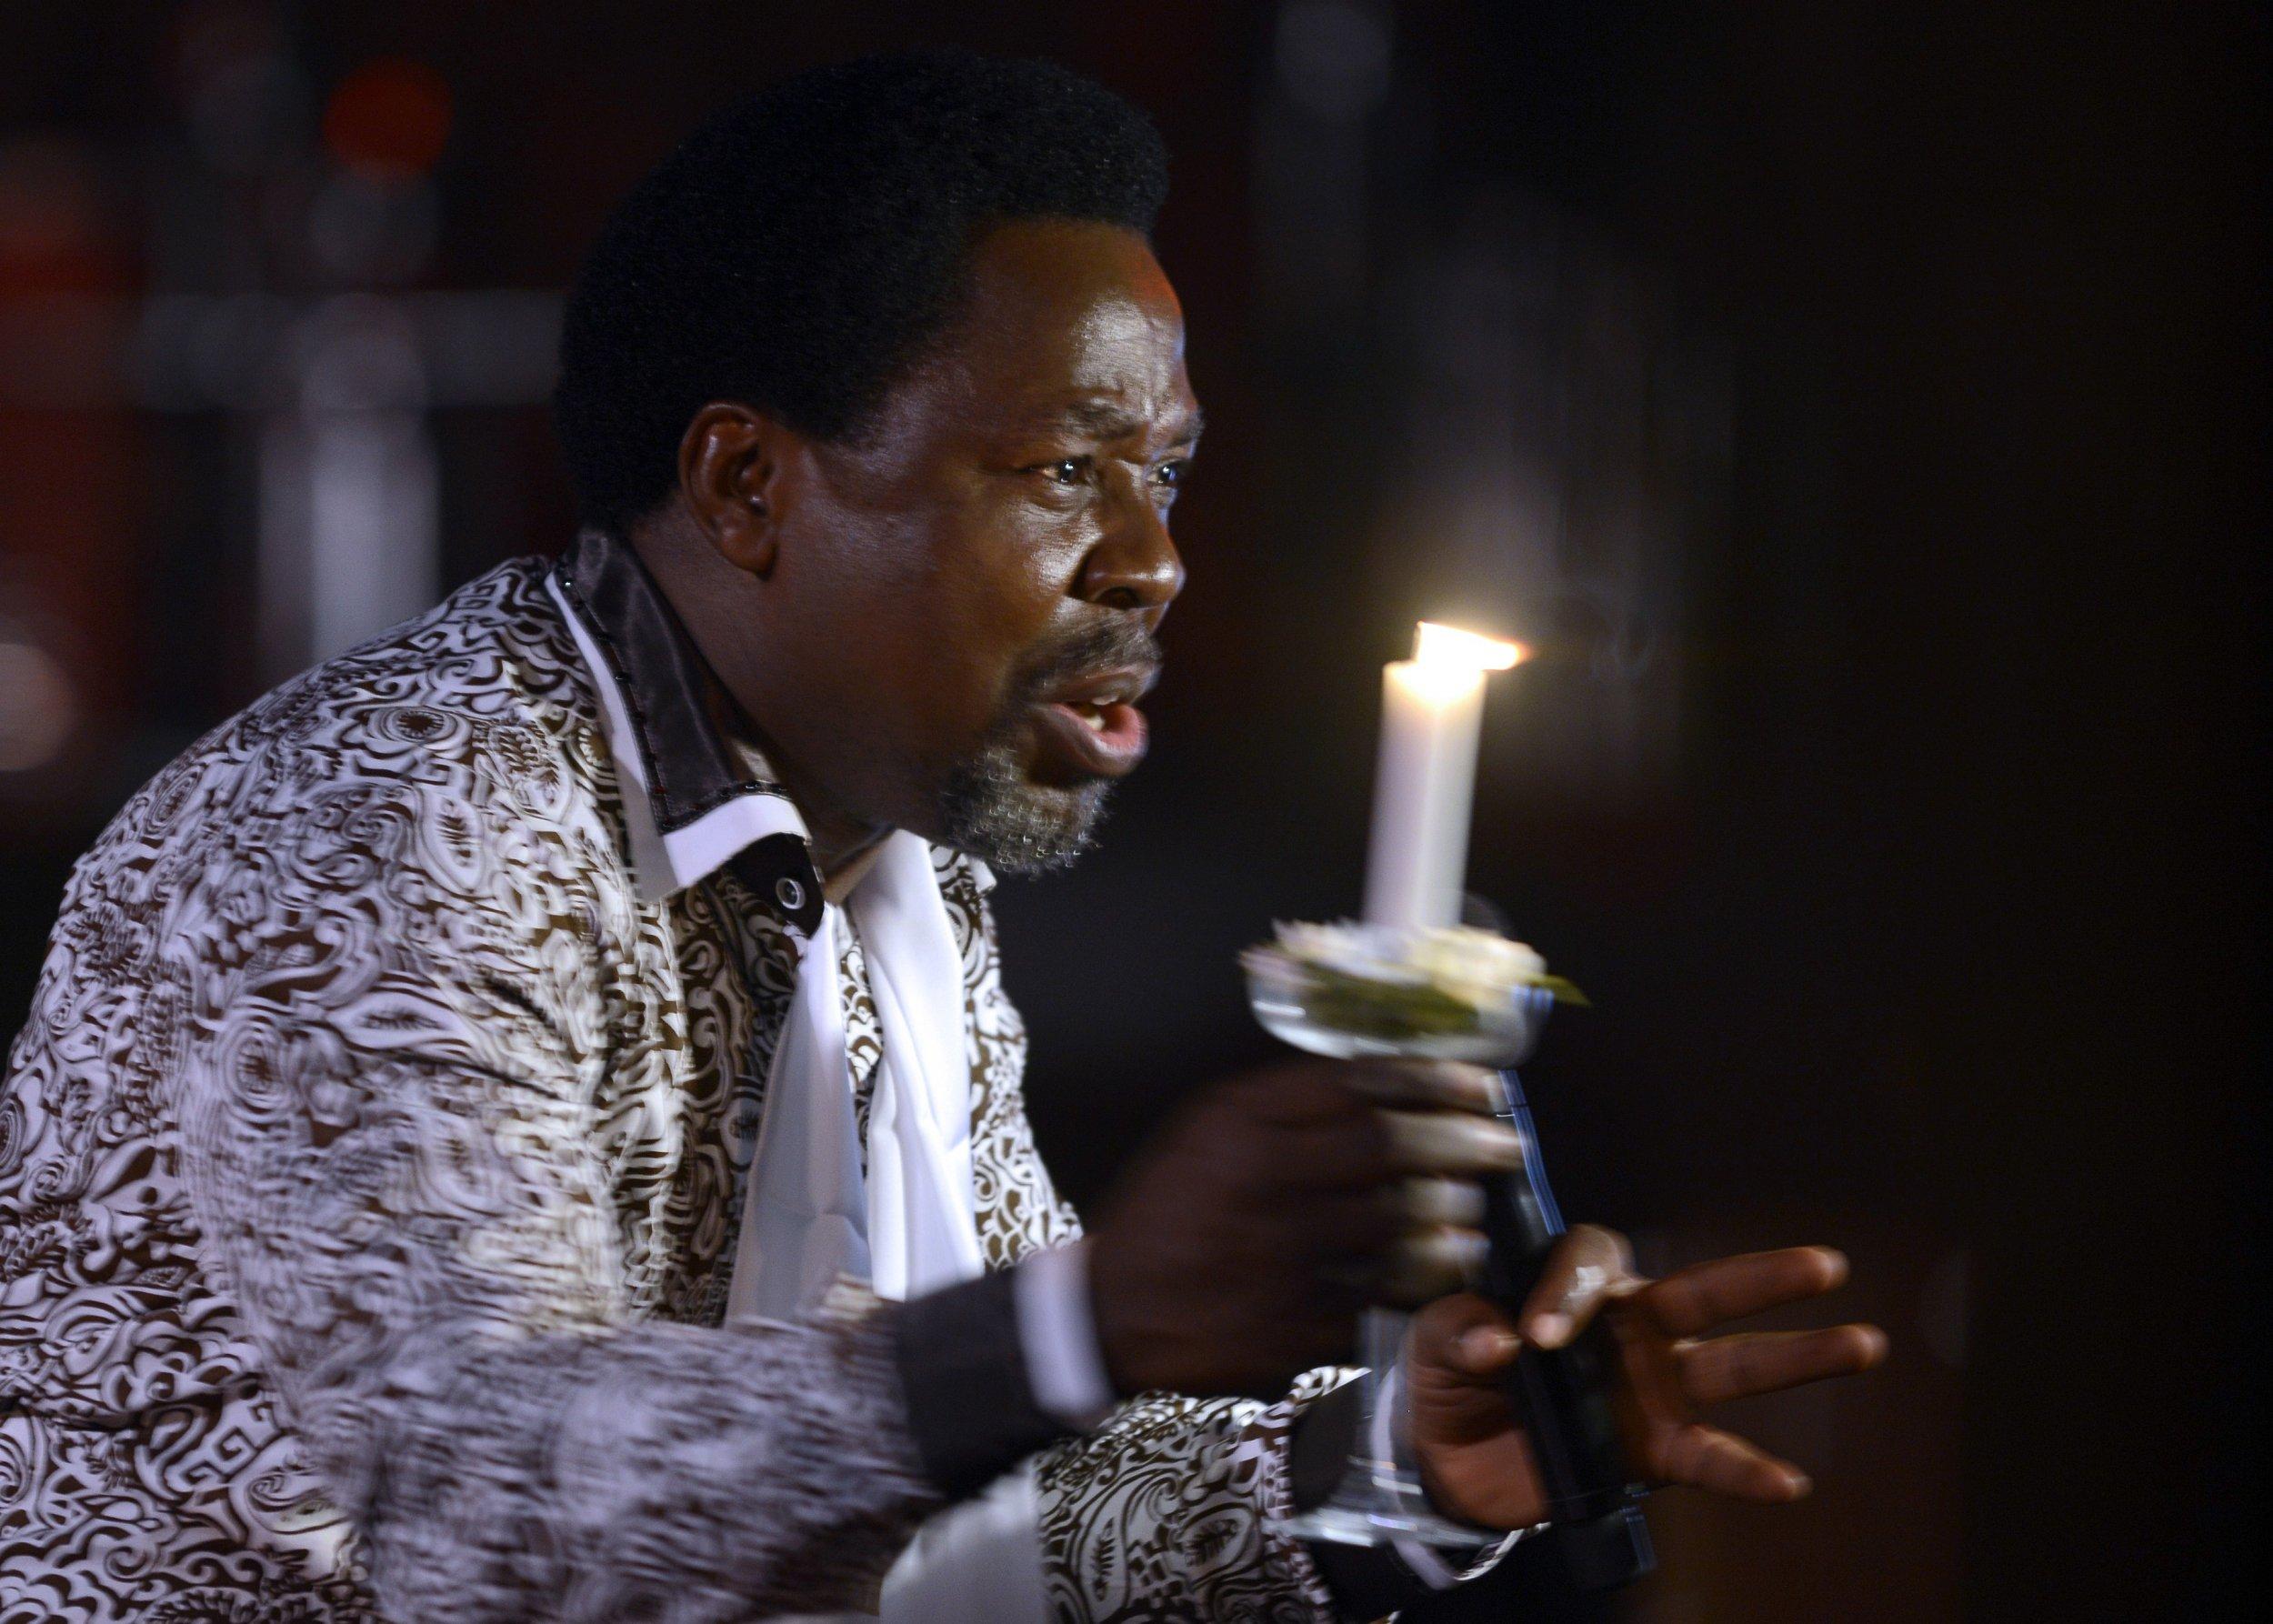 Nigerian pastor TB Joshua speaks at a memorial service.